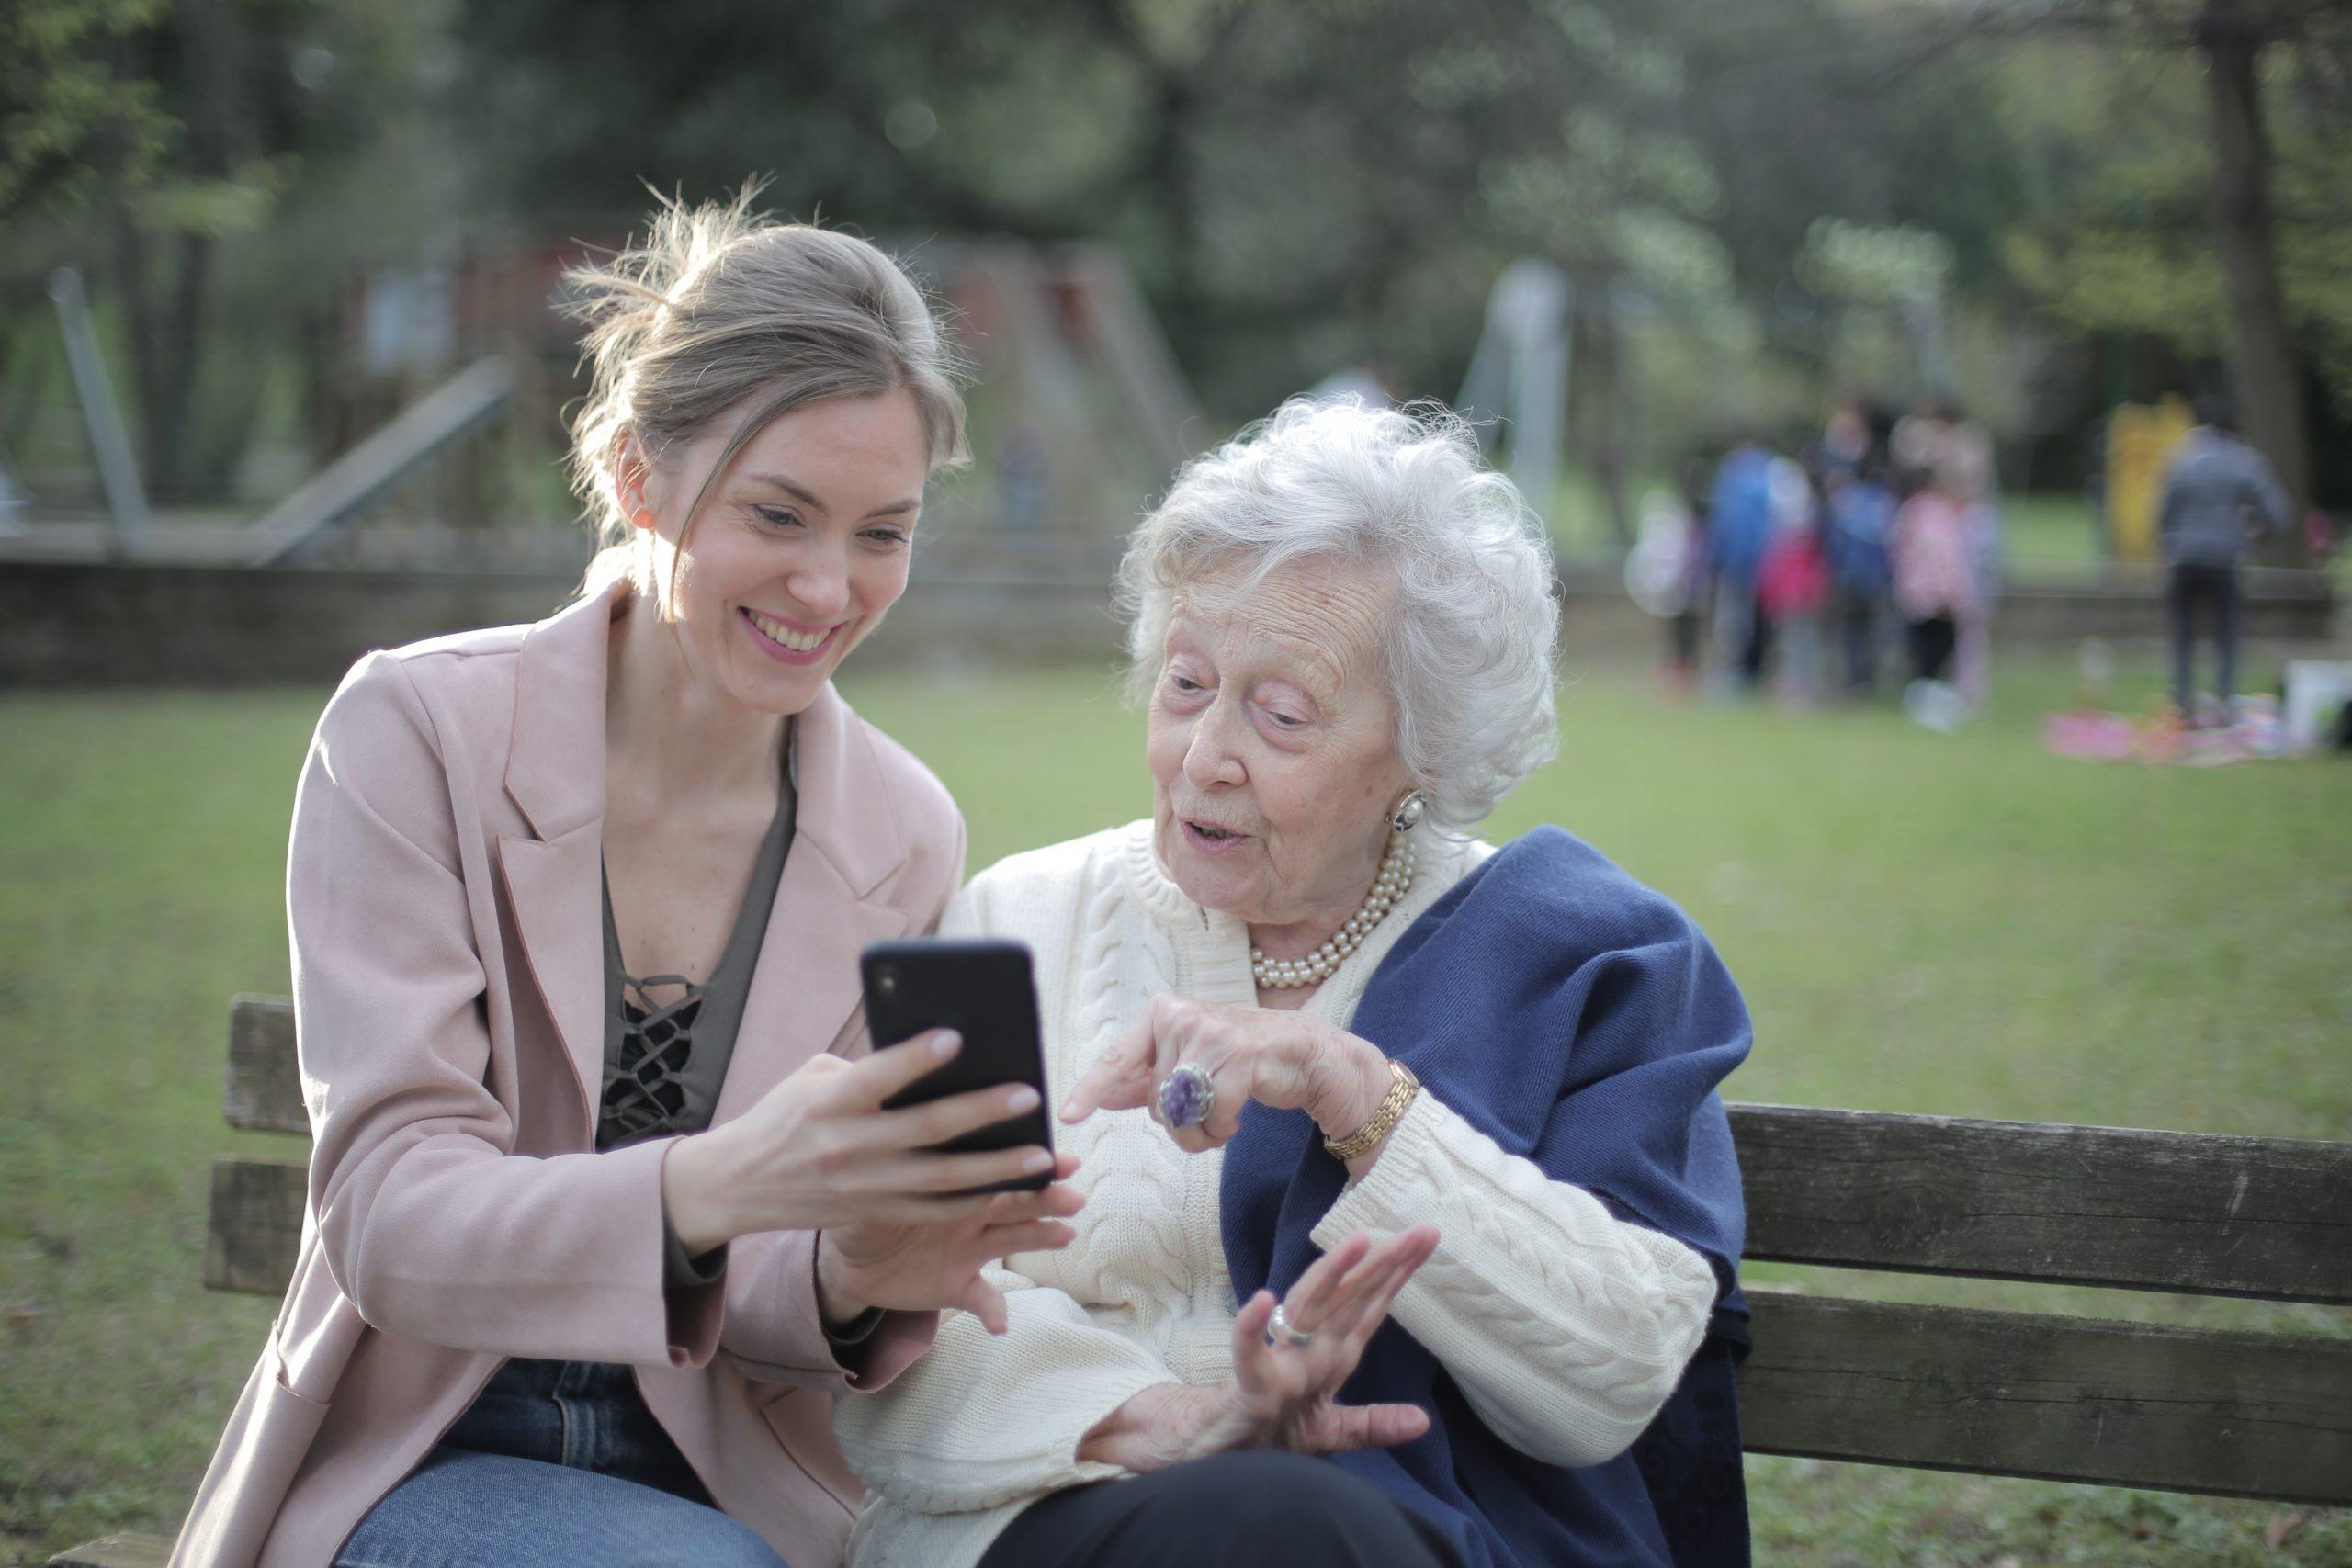 Mujer joven mostrandole smartphone a mujer anciana